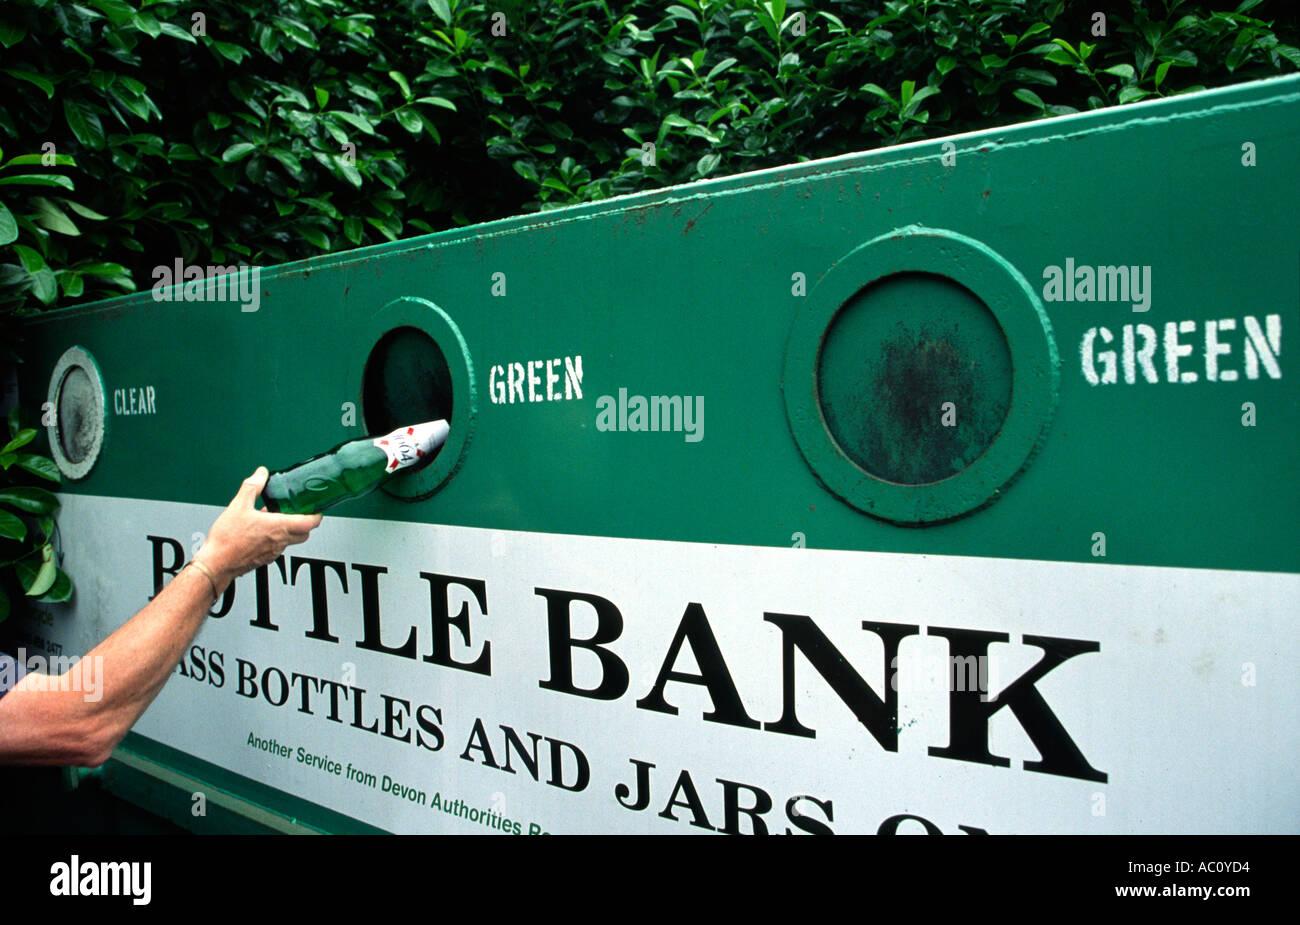 Man deposting bottle in Bottle Bank Devon England - Stock Image